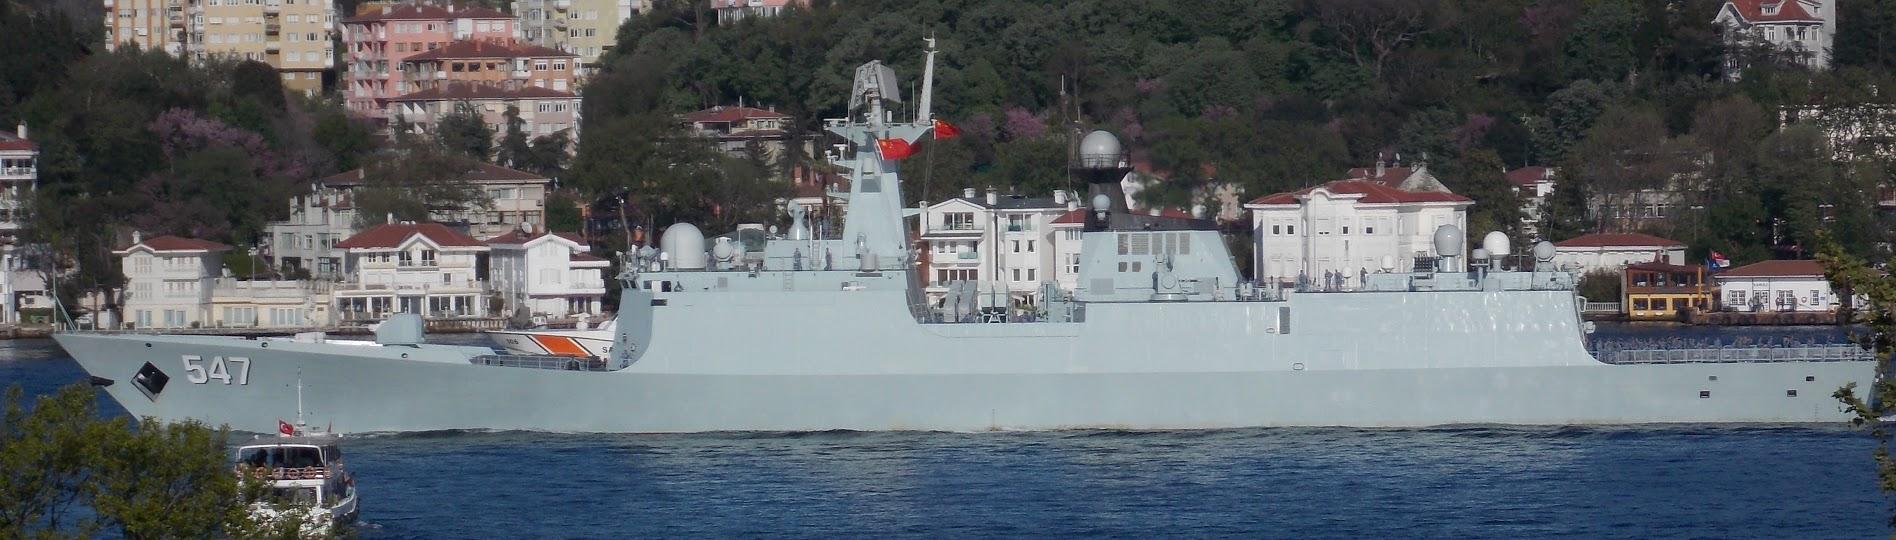 kitaiskii-fregat3